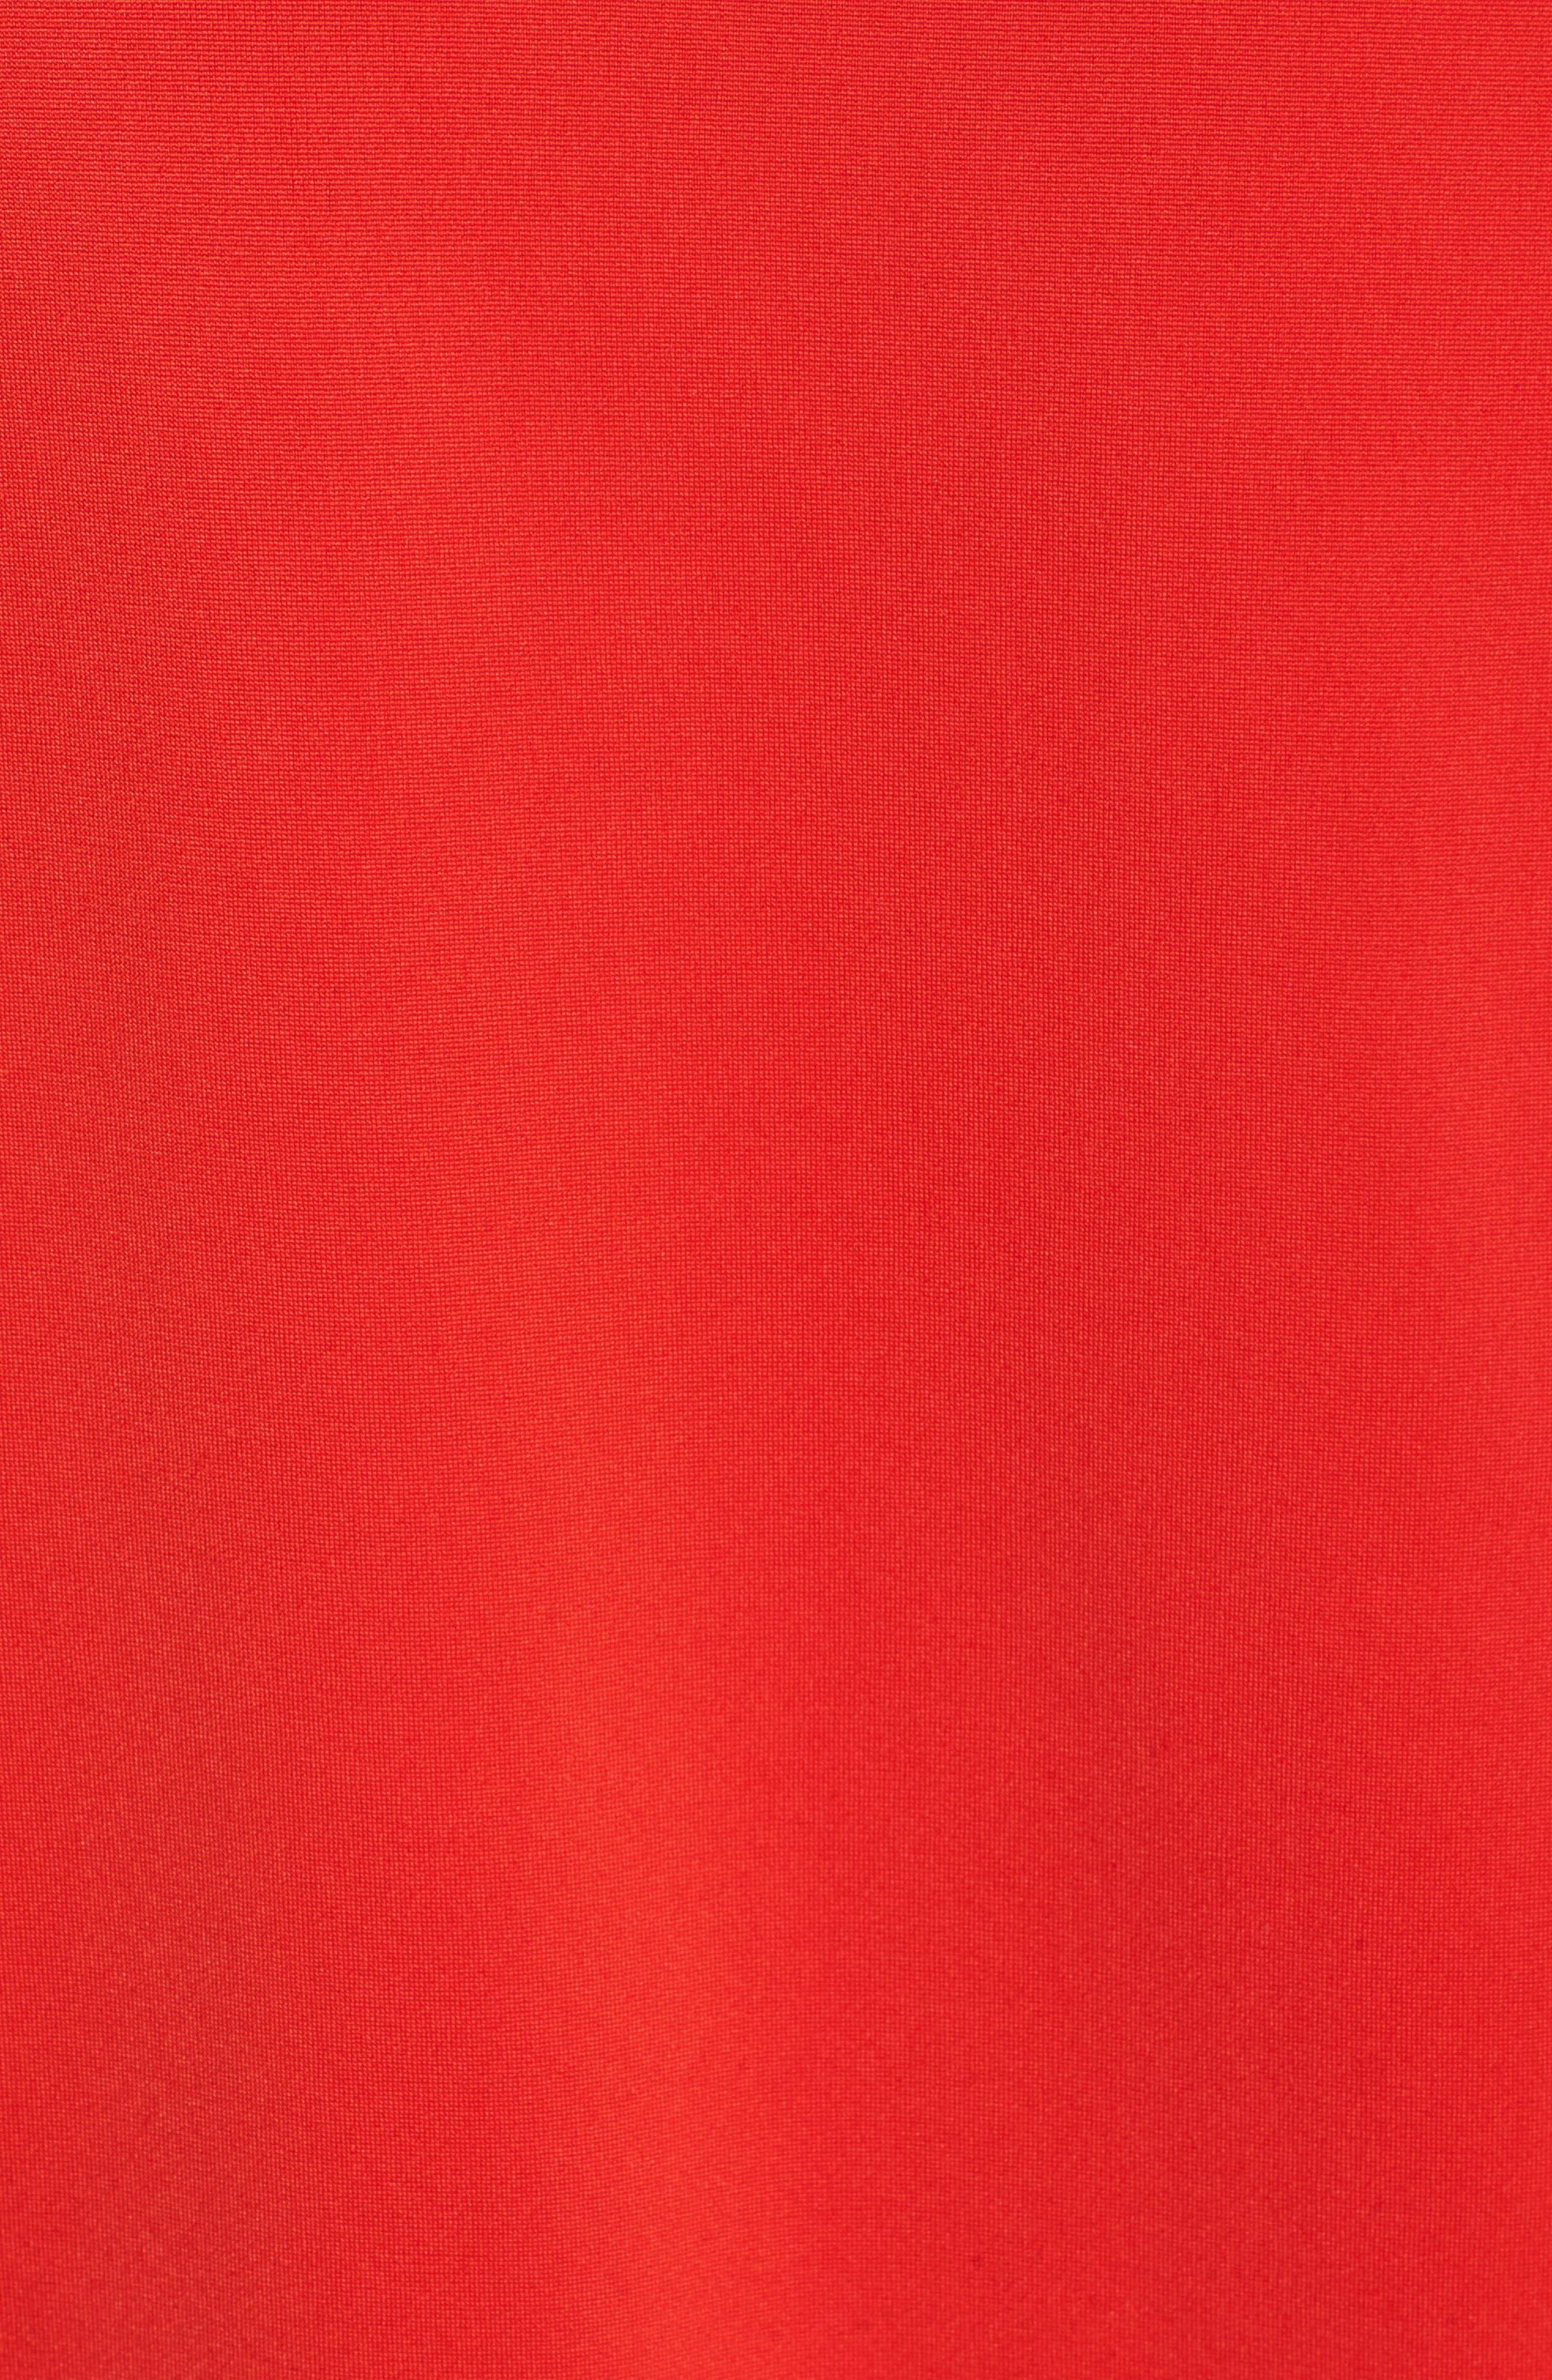 222 Banda 10 Anay Jacket,                             Alternate thumbnail 8, color,                             Red Flame -White